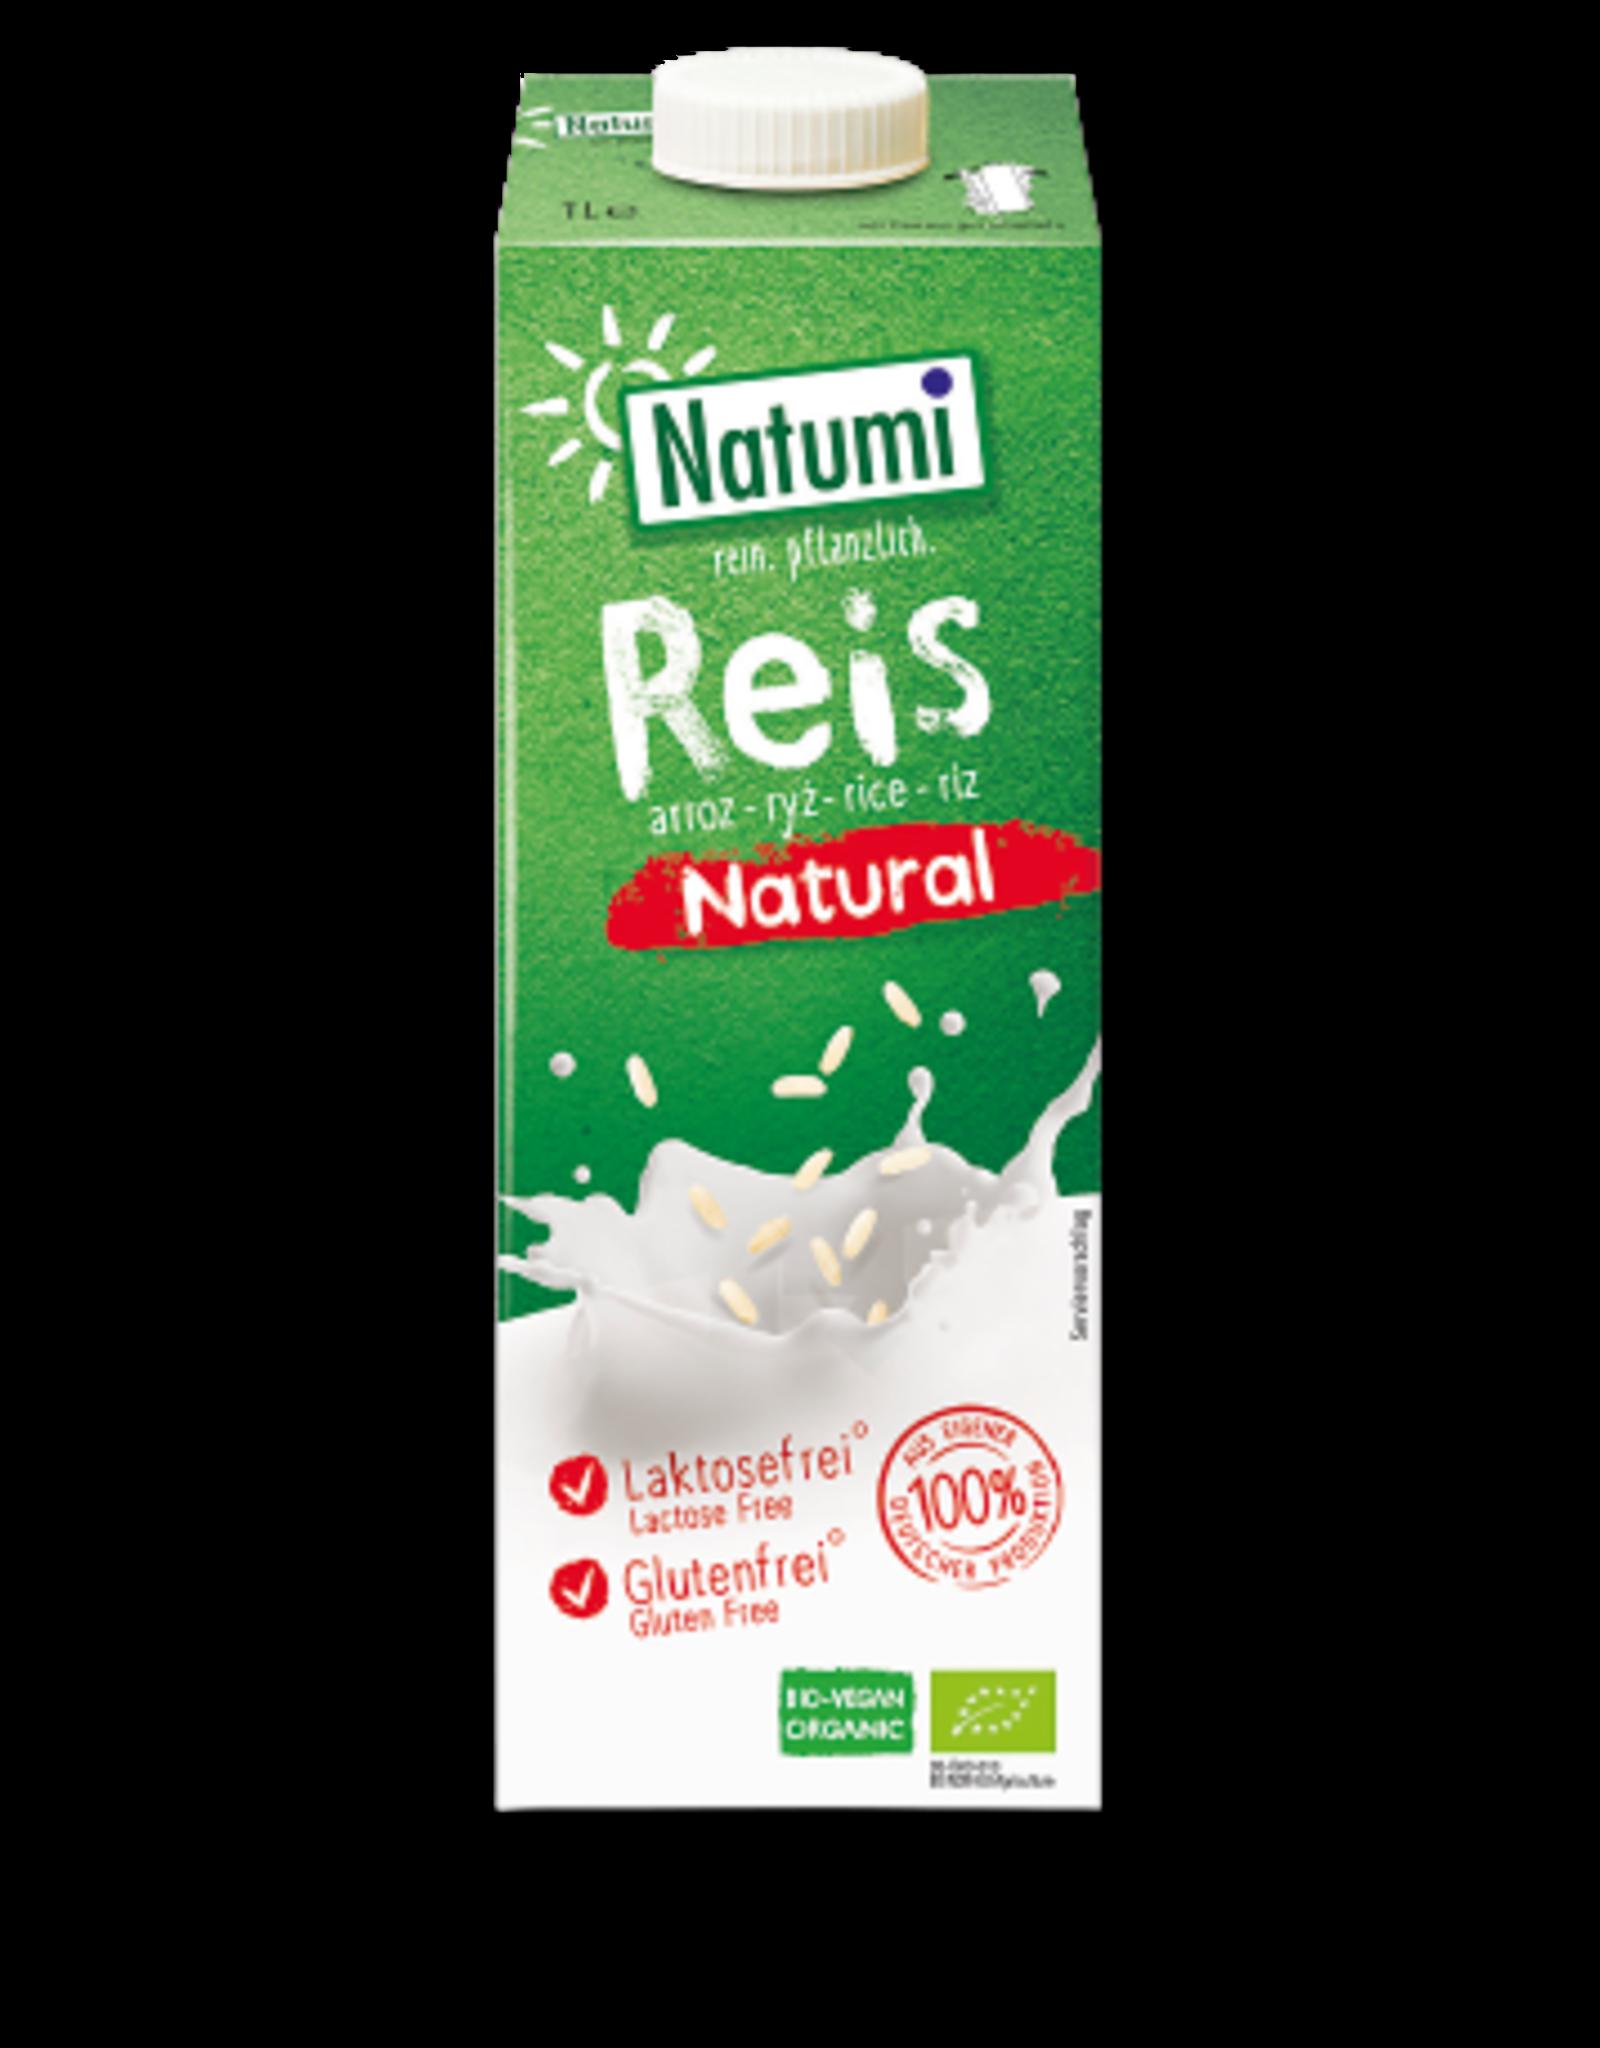 Natumi Reis natural, 1000ml